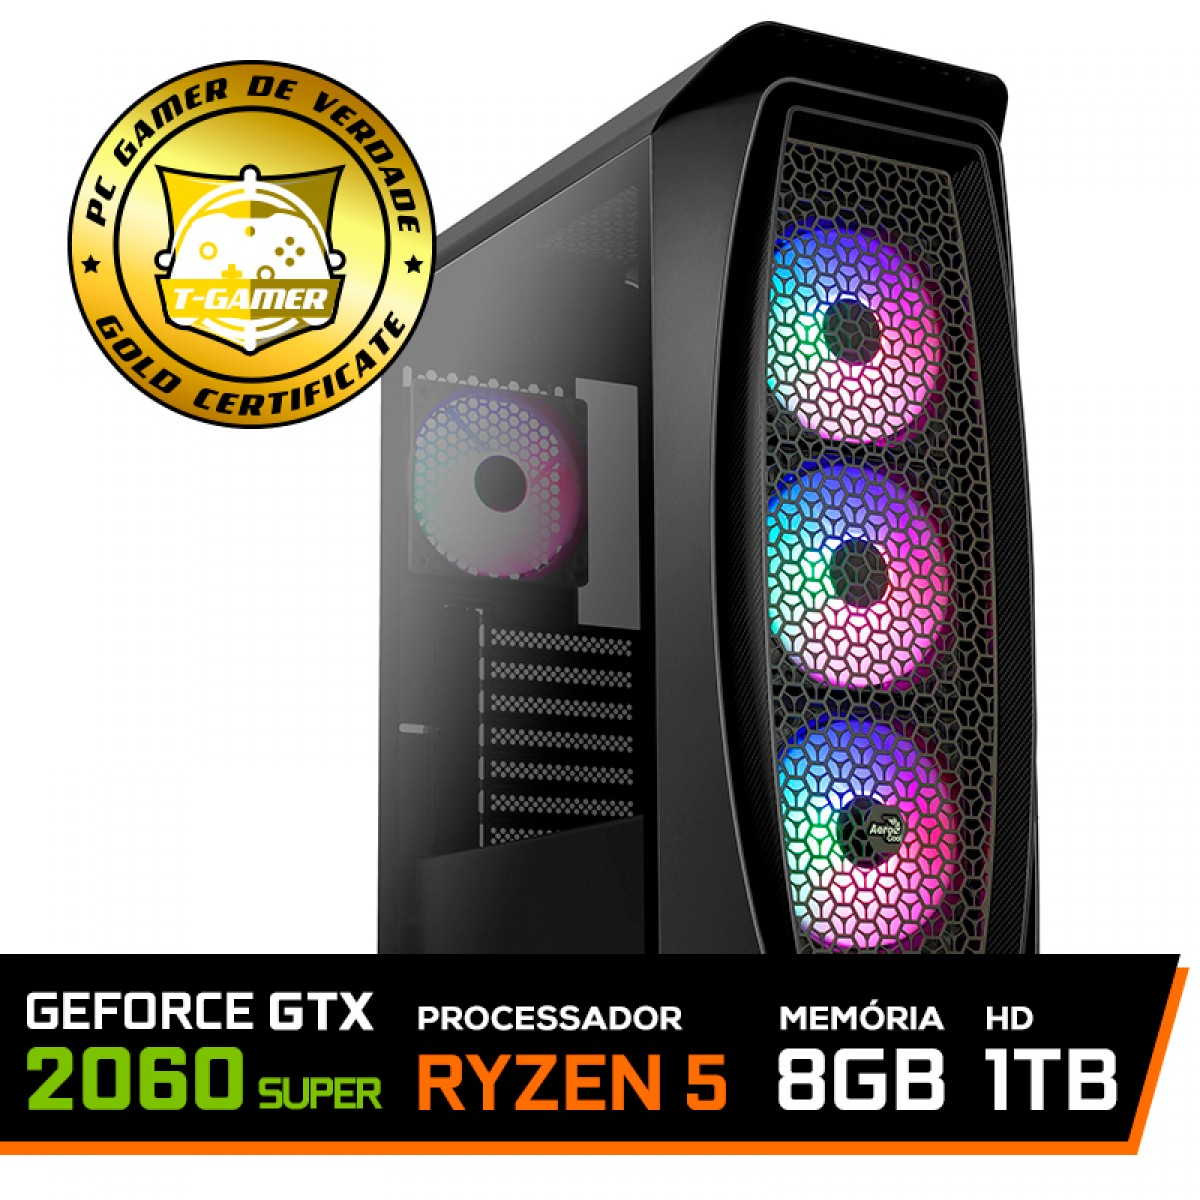 Pc Gamer T-General Lvl-5 Amd Ryzen 5 3600 / GeForce RTX 2060 Super / DDR4 8GB / HD 1TB / 600W